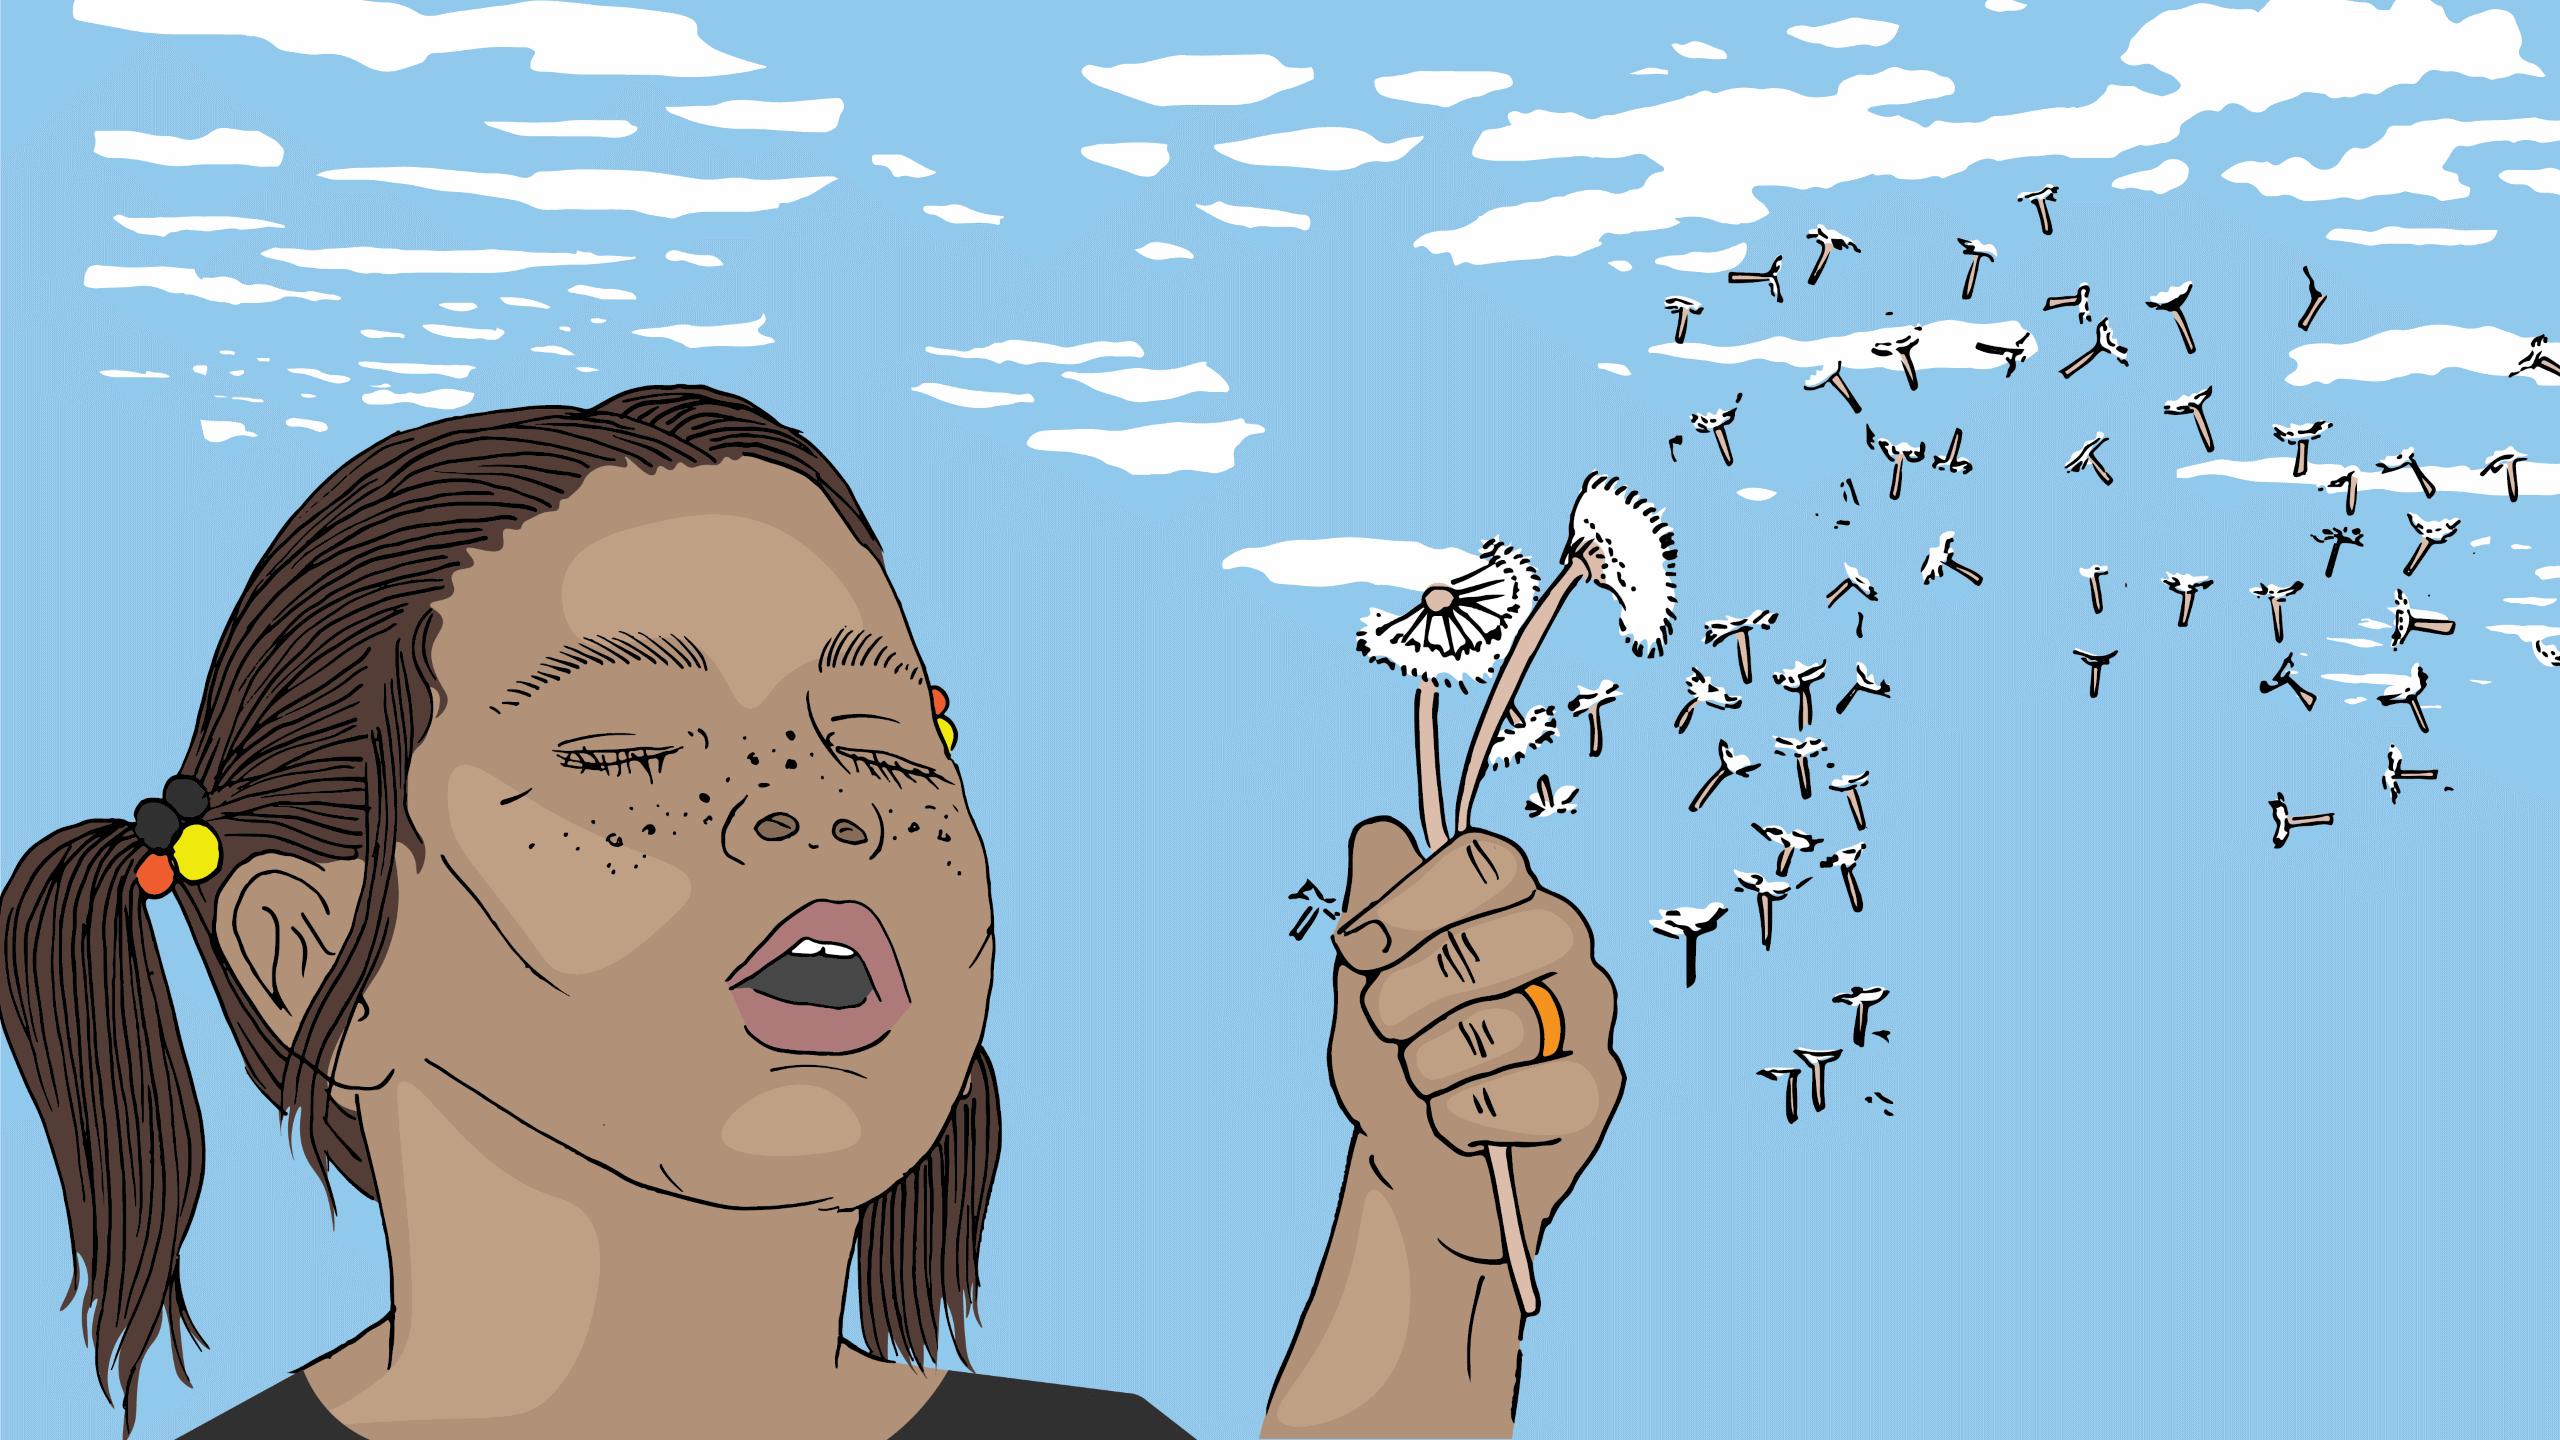 Artwork by Jacob Komesaroff